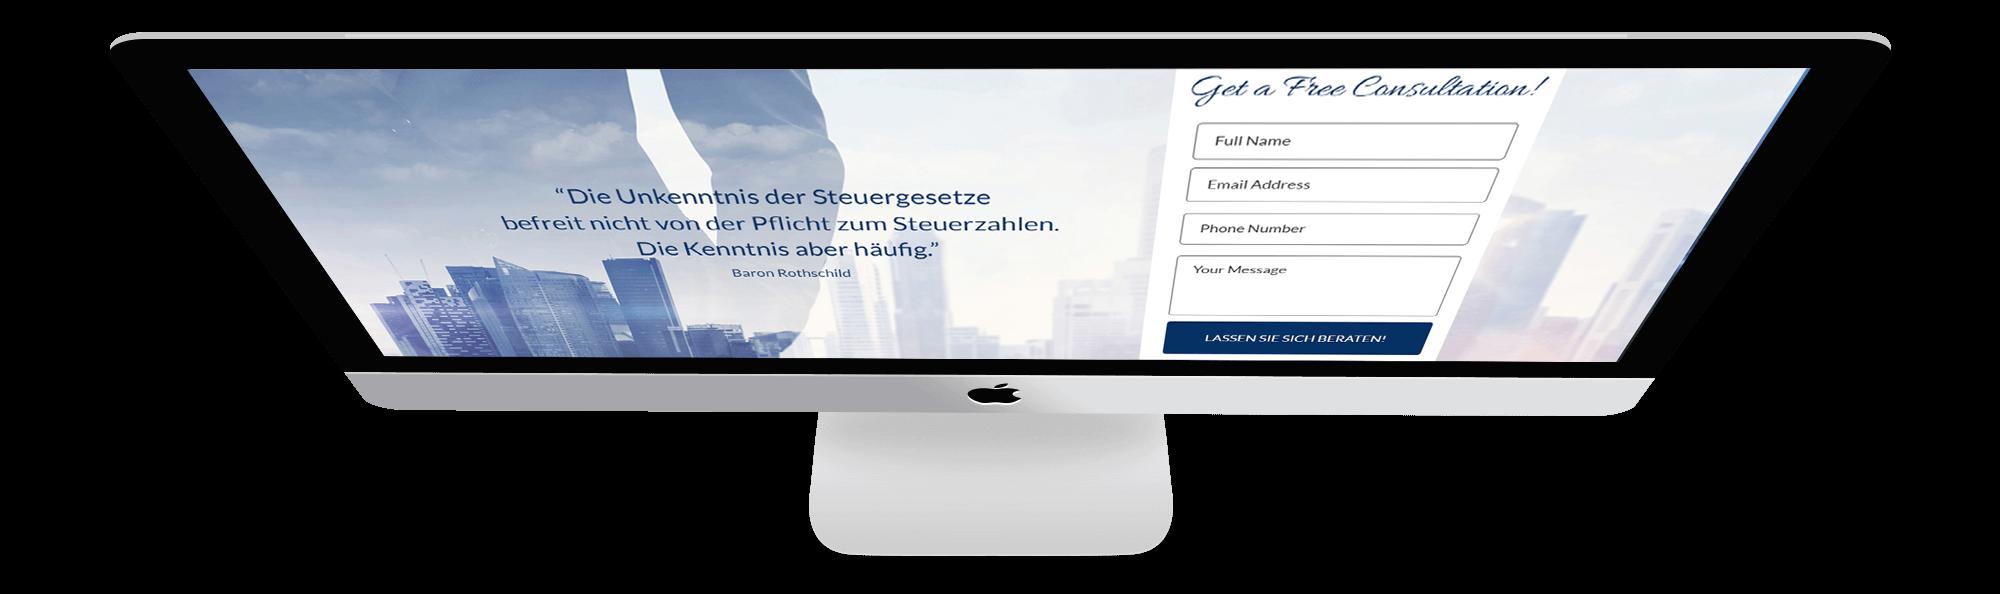 Rottger & Partner-BrandCrock-portfolio-free consultation-imac